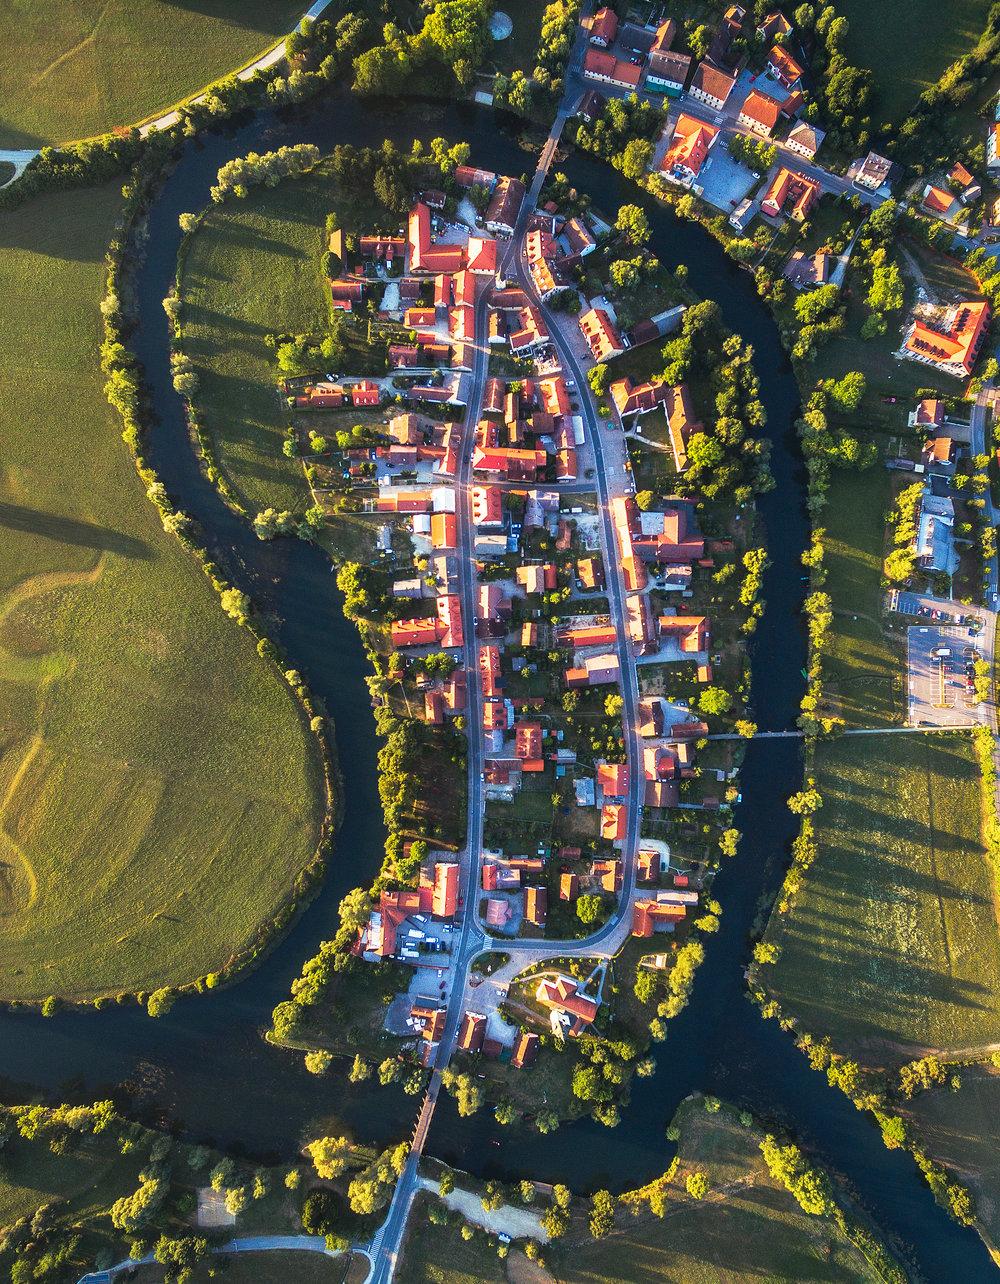 Kostanjevica na Krki Slovenia aerial photo by Michael Matti.jpg